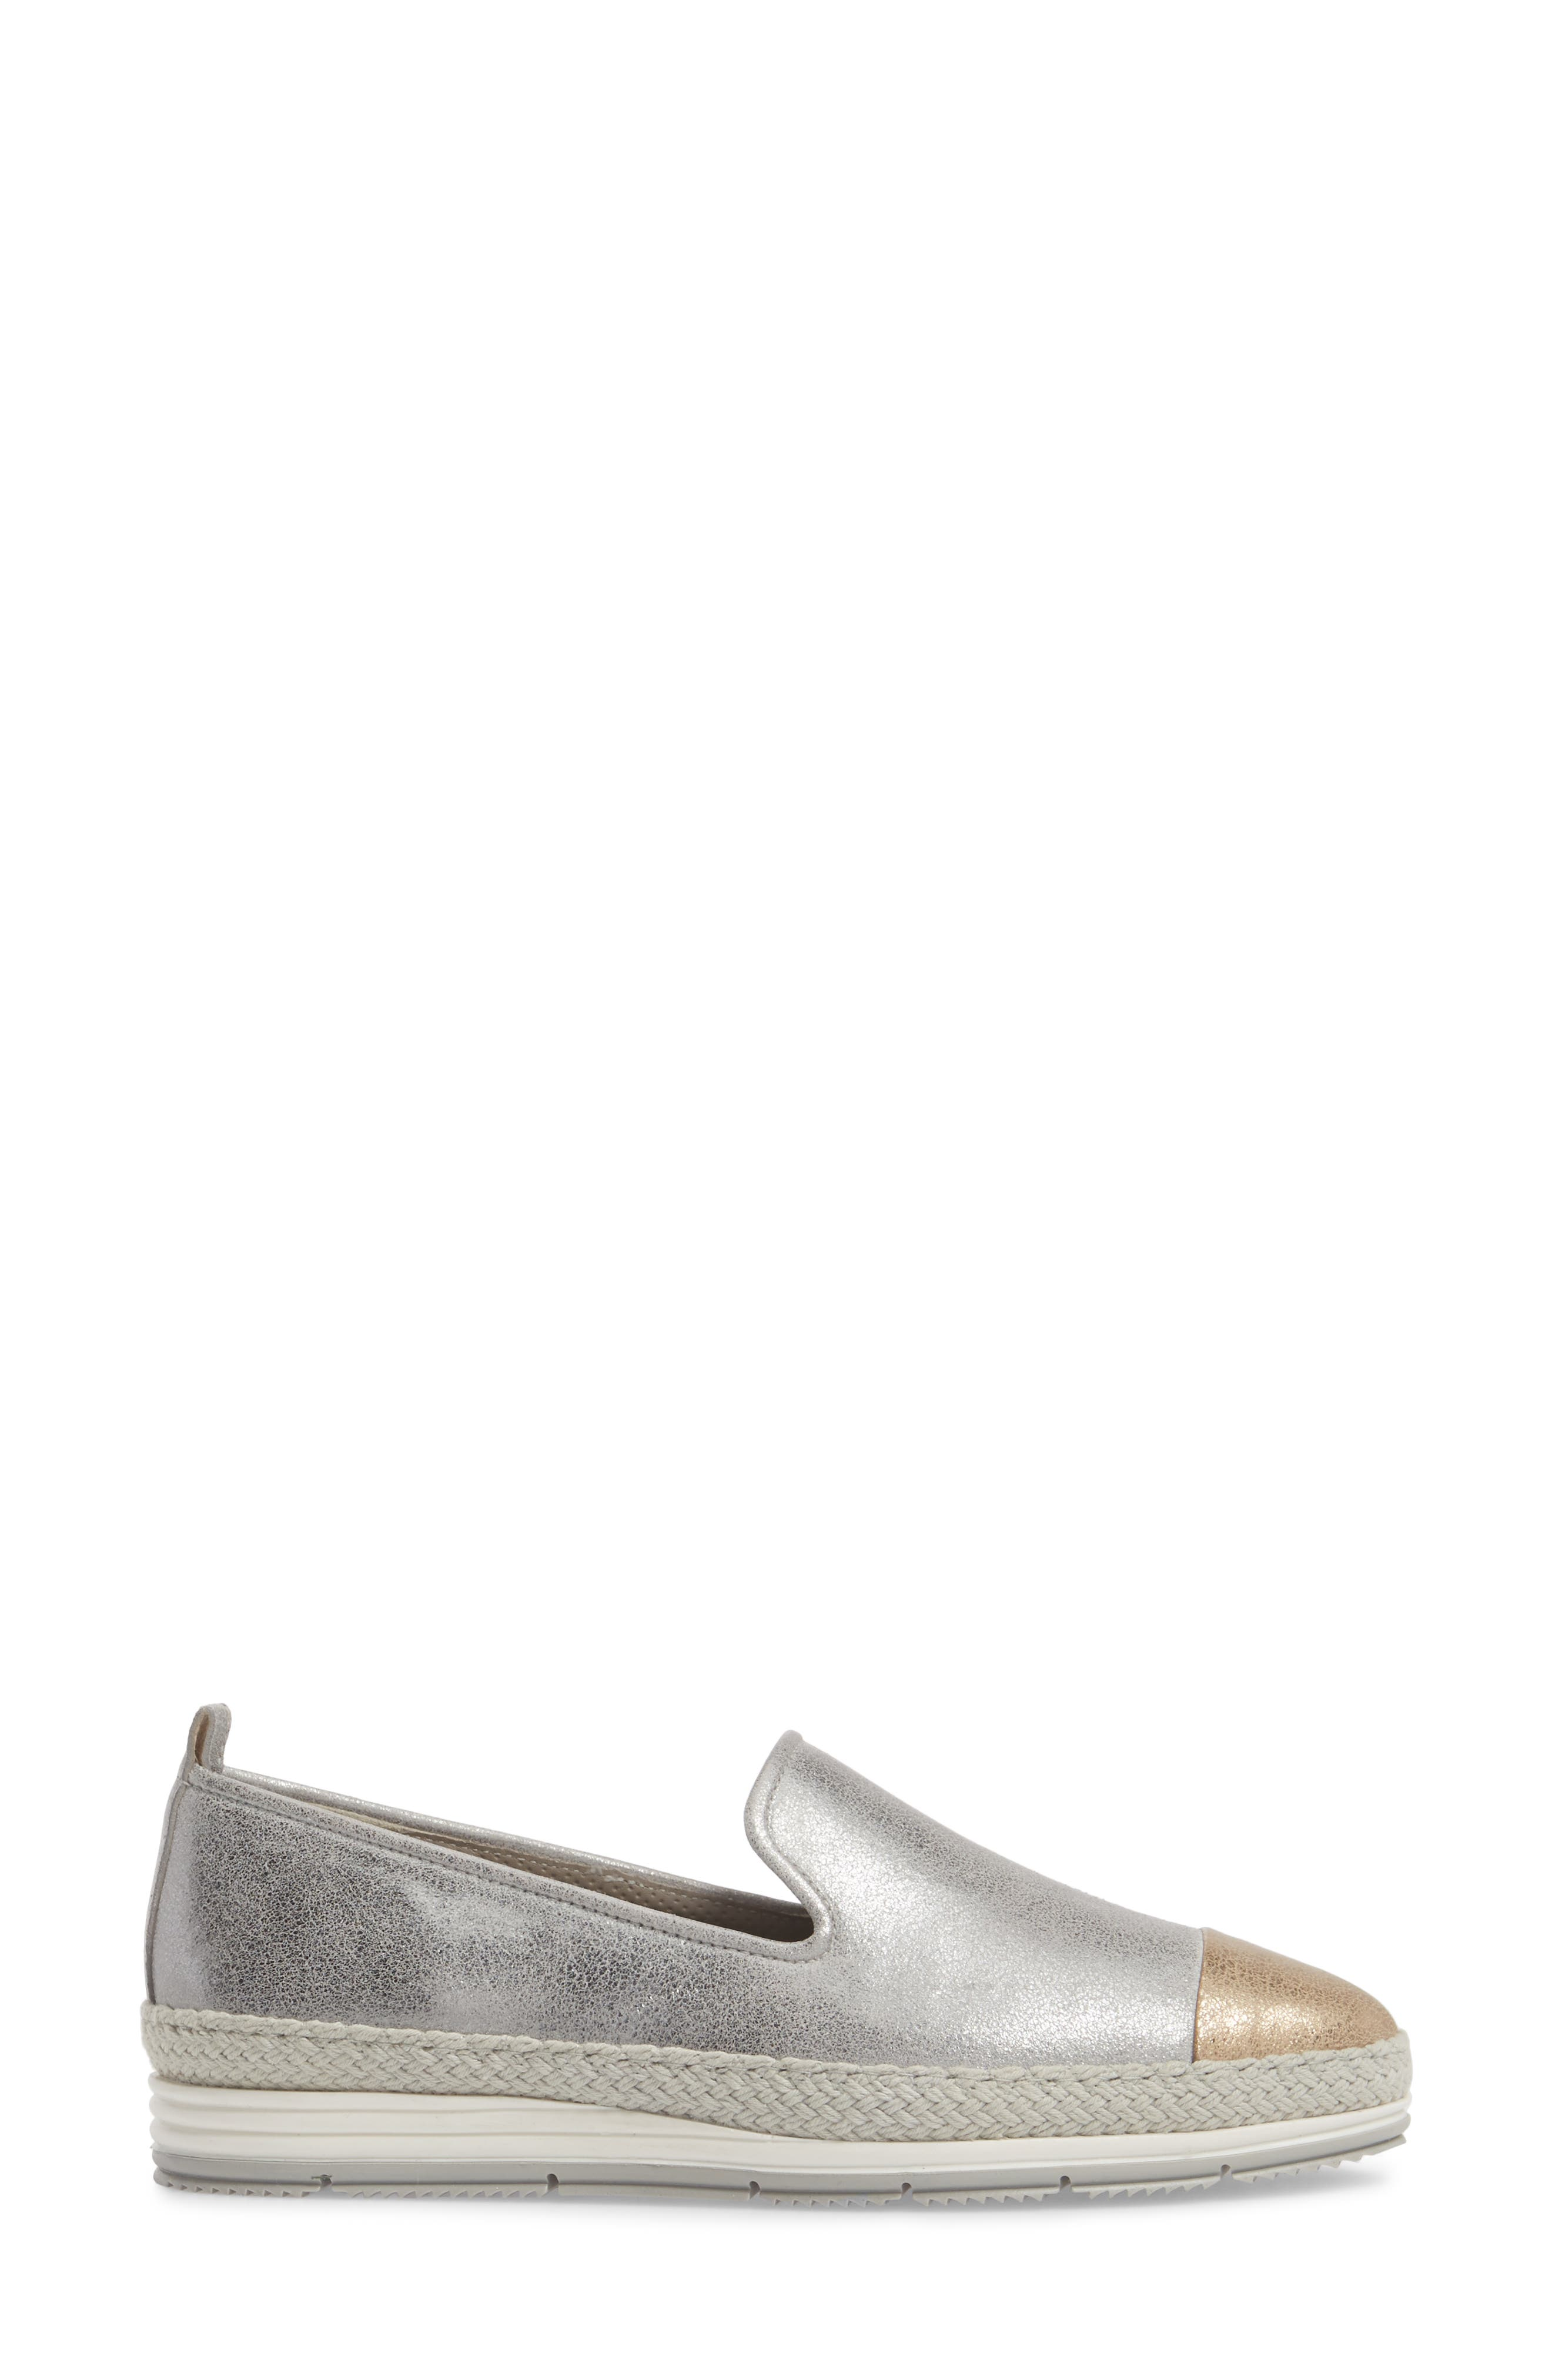 Posh Flat,                             Alternate thumbnail 3, color,                             Sabbia/ Platino Leather